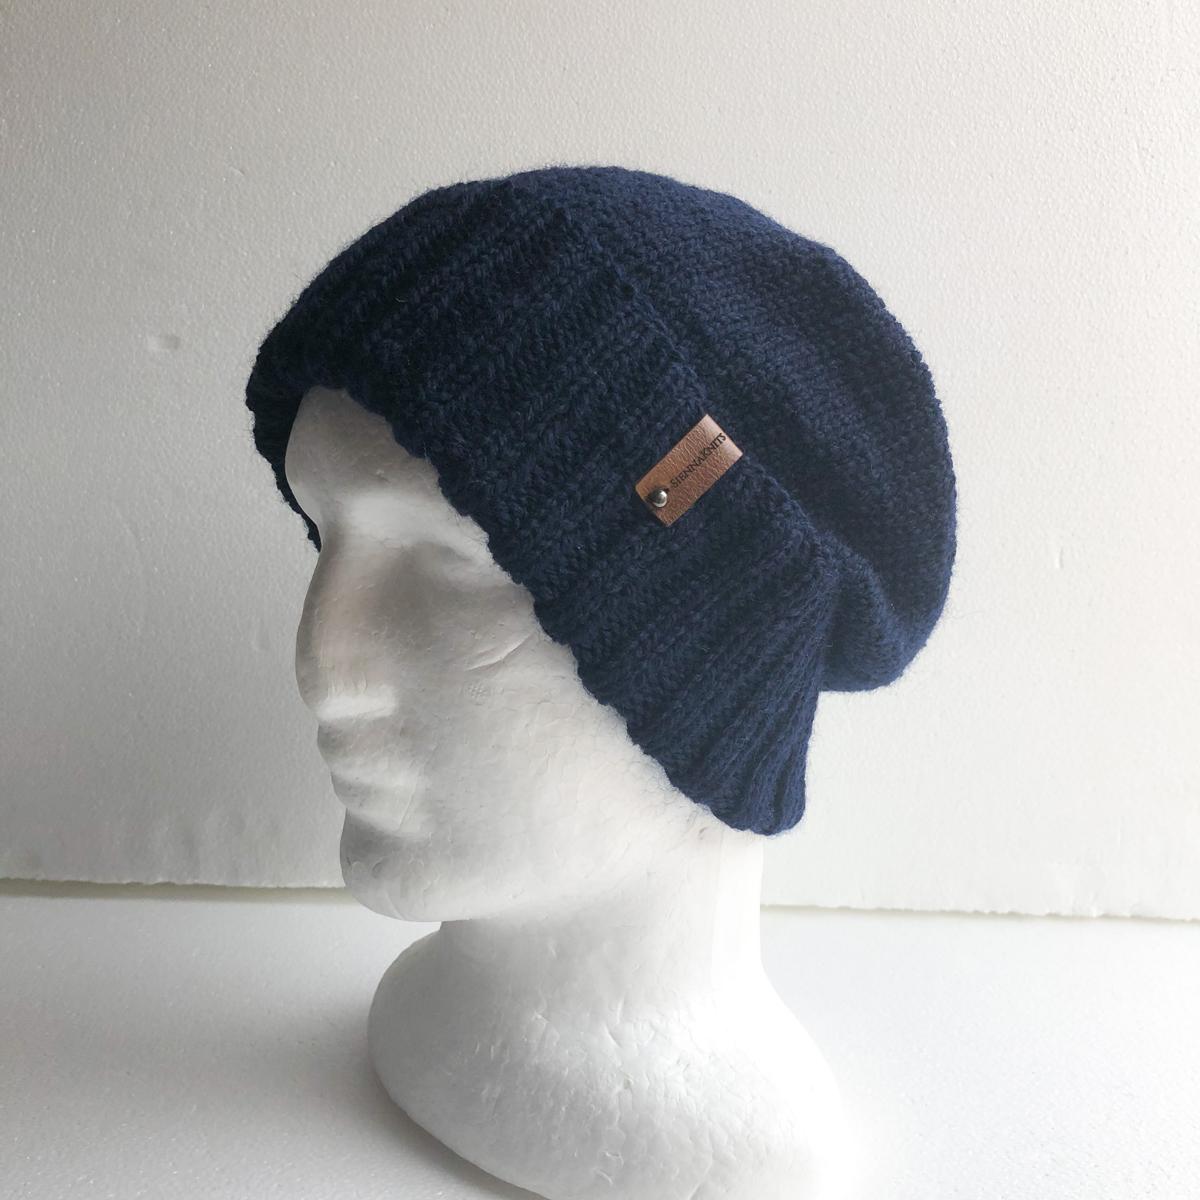 100% Wool Navy Knit Men Beanie With Foldable Brim By SiennaKnits